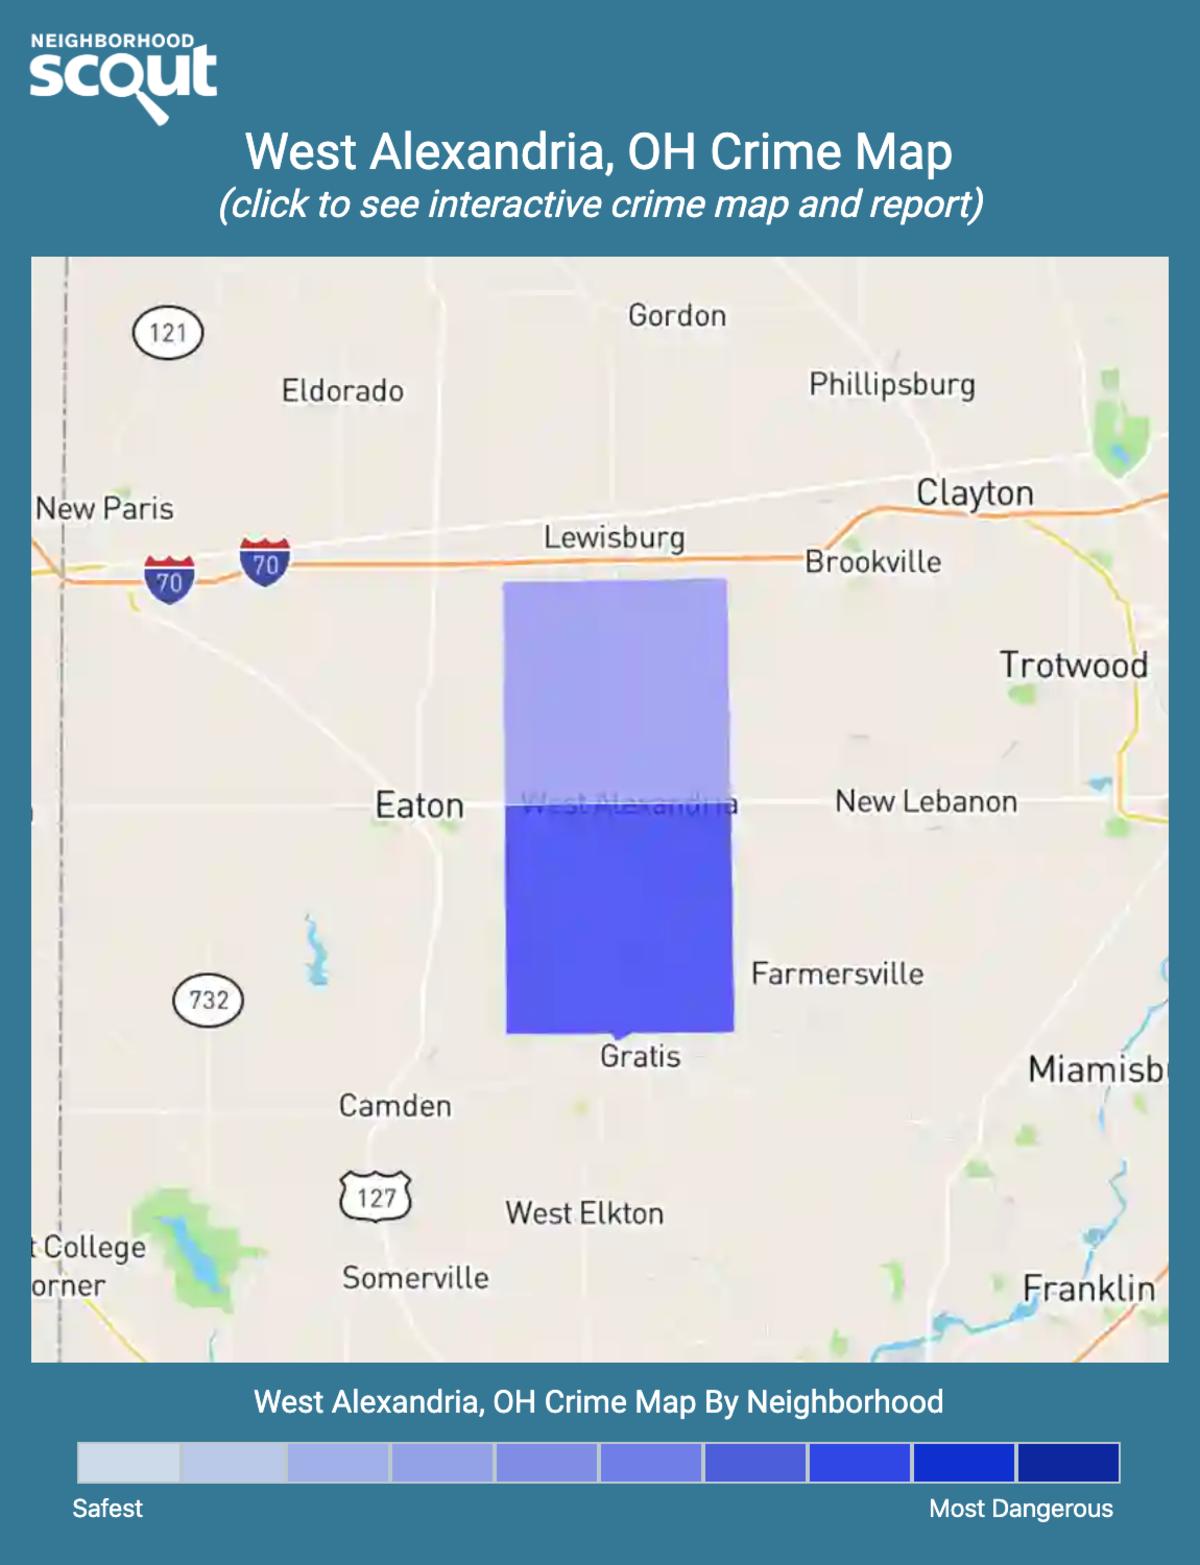 West Alexandria, Ohio crime map